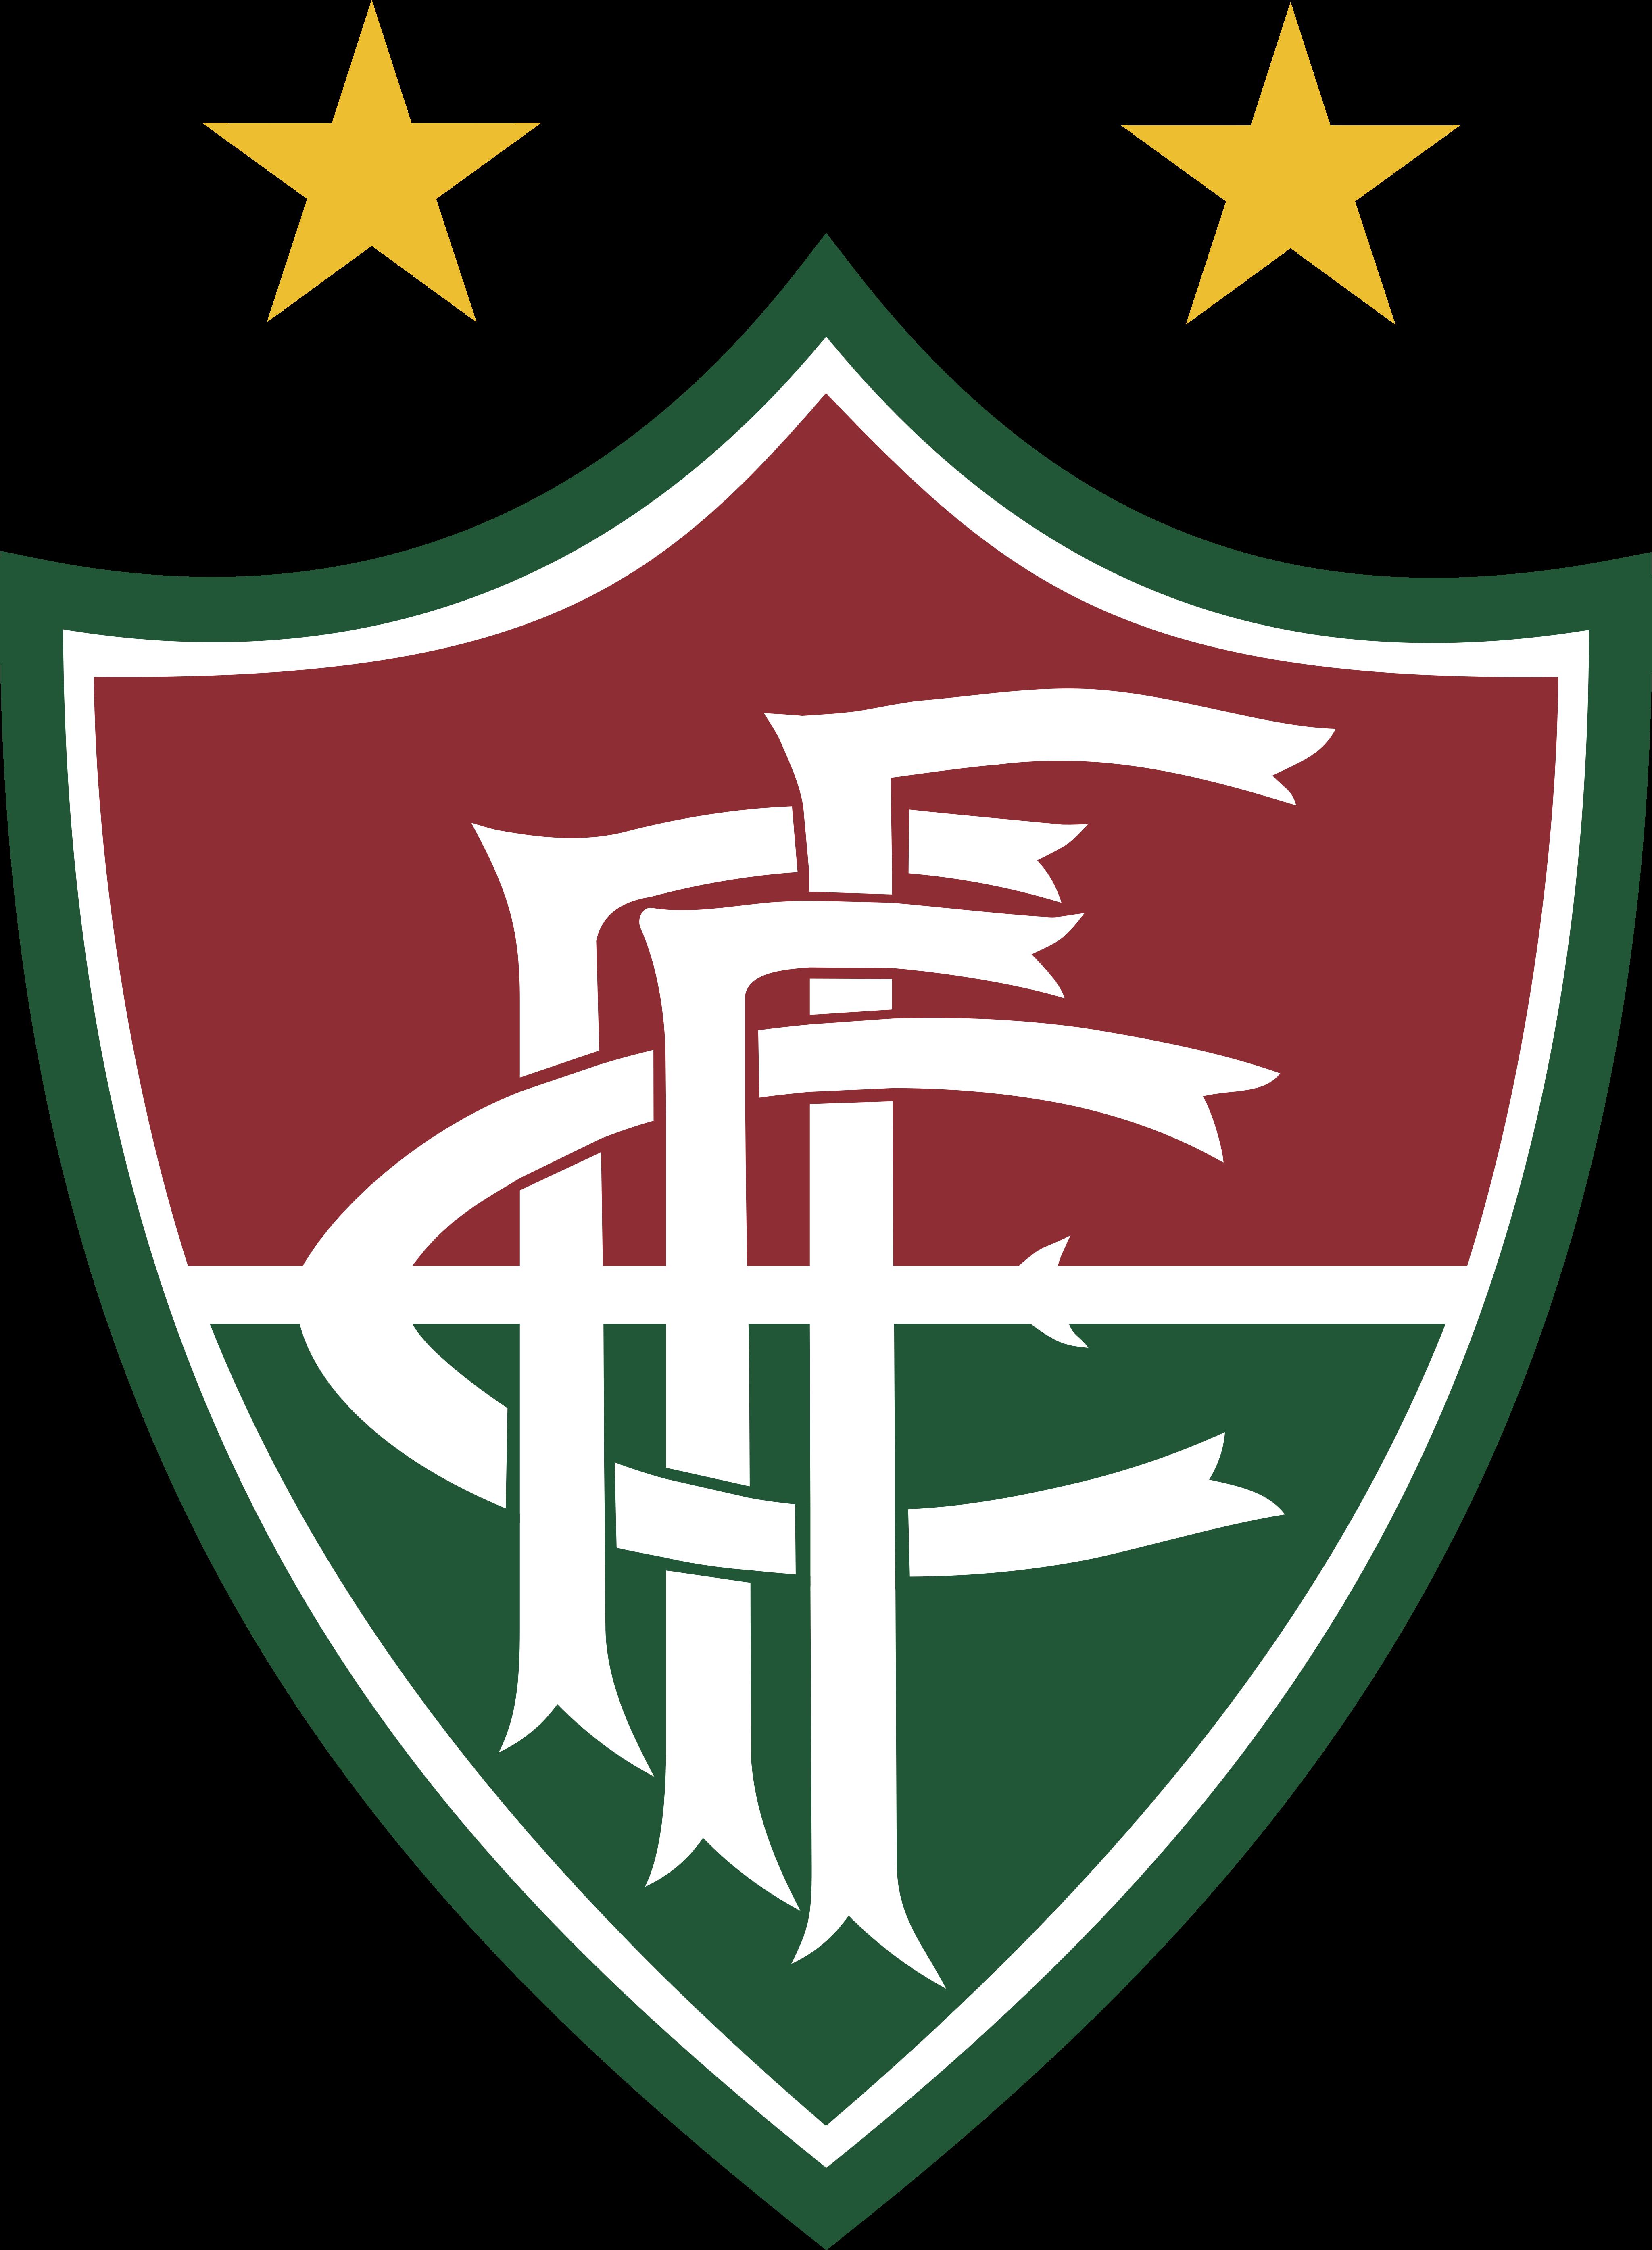 fluminense de feira logo - Fluminense de Feira FC Logo